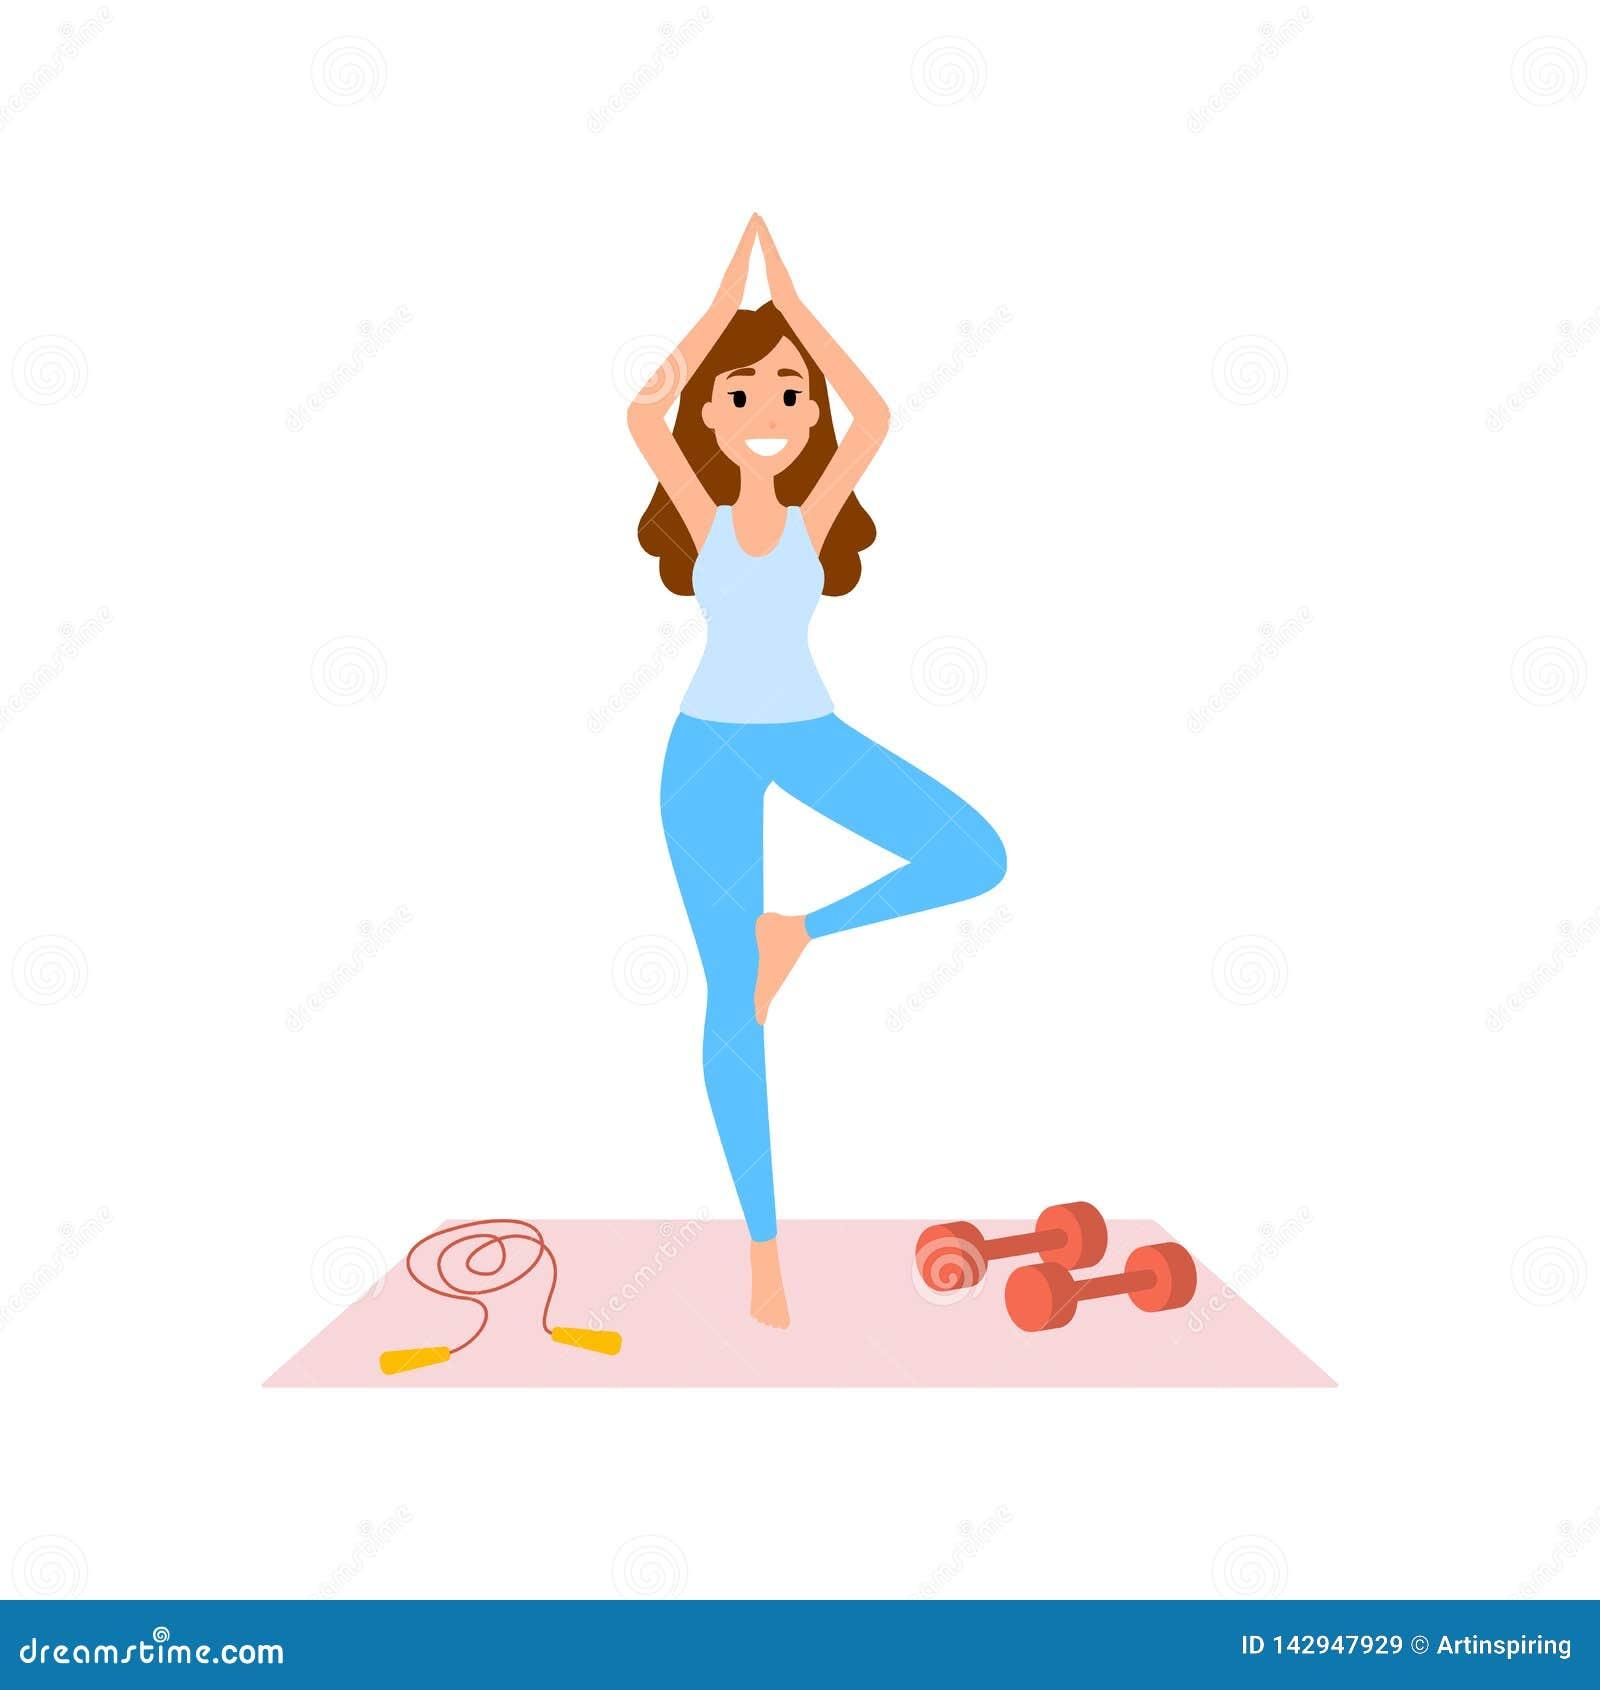 Woman Doing Yoga Exercise Meditation Pose And Body Stock Vector Illustration Of Gymnastics Meditation 142947929